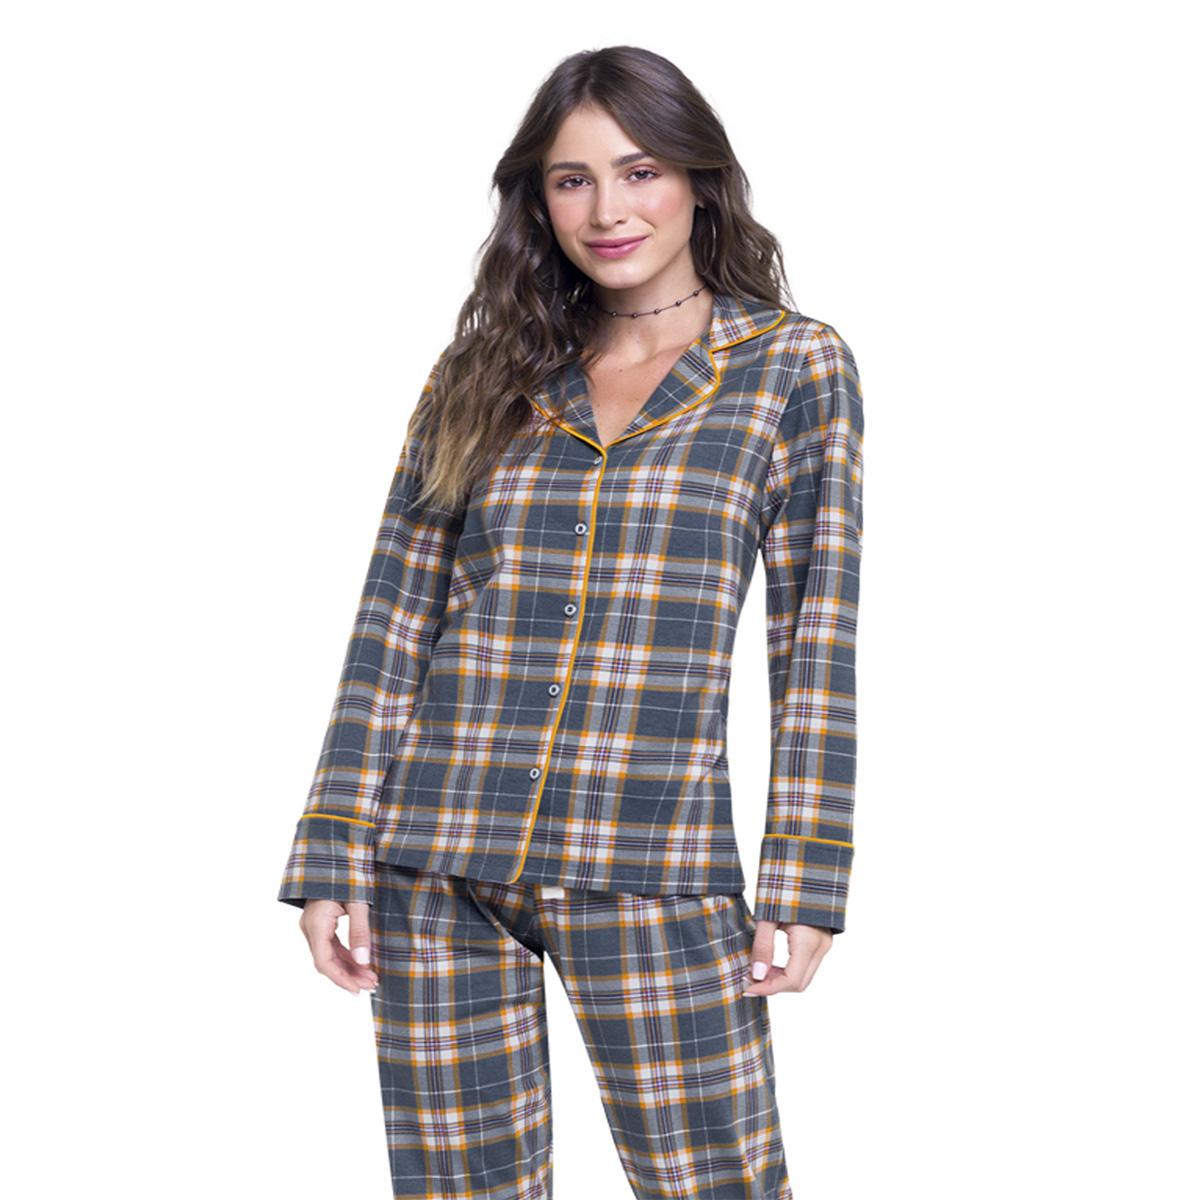 Pijama americano feminino botão xadrez mãe frio